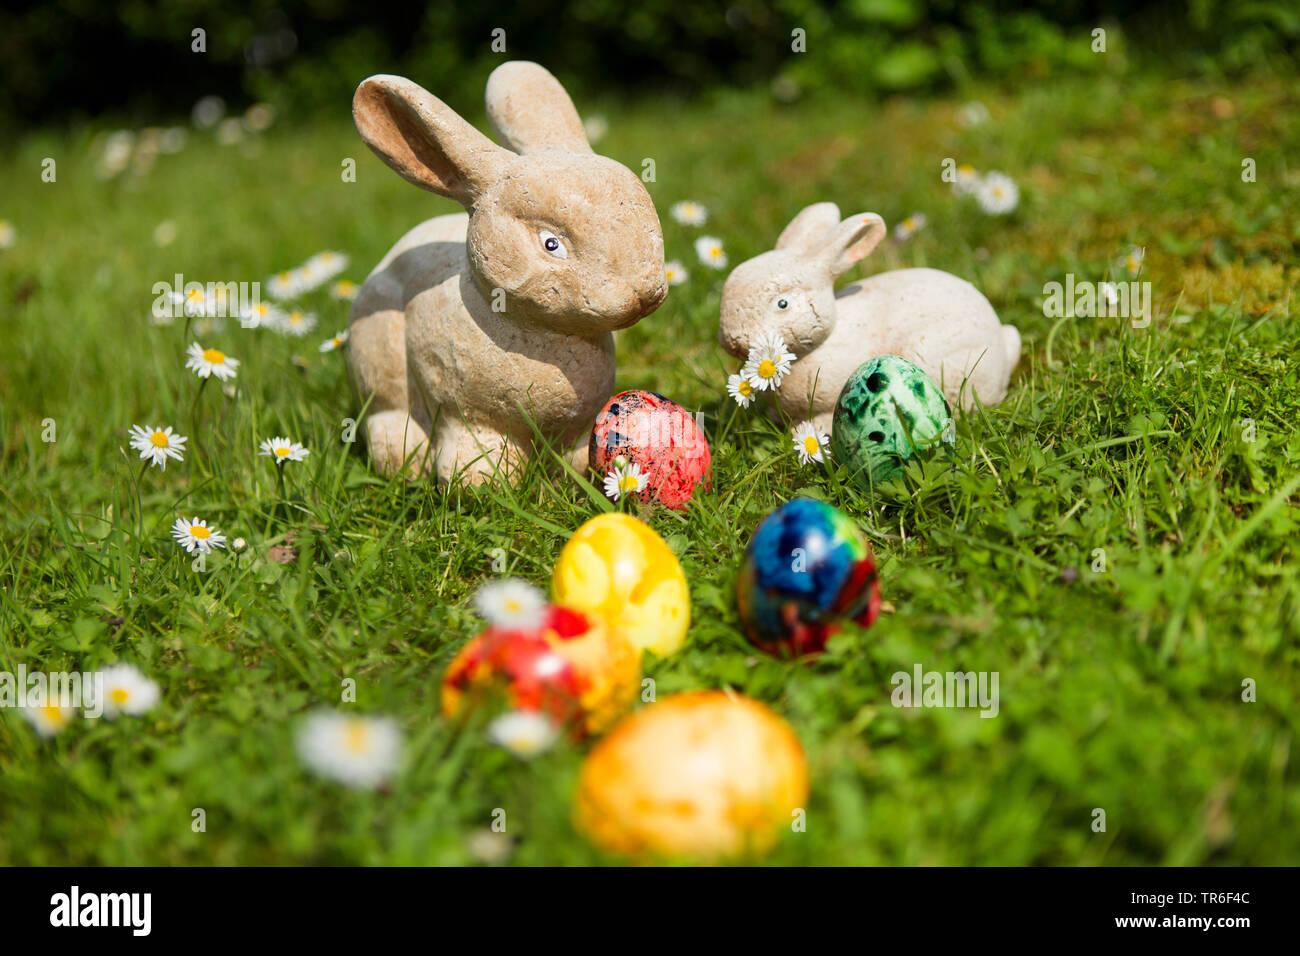 Deko-Osterhasen und bunte Ostereier auf dem Rasen, Deutschland | Easter bunnies and Easter eggs on lawn, Germany | BLWS482611.jpg [ (c) blickwinkel/R. - Stock Image